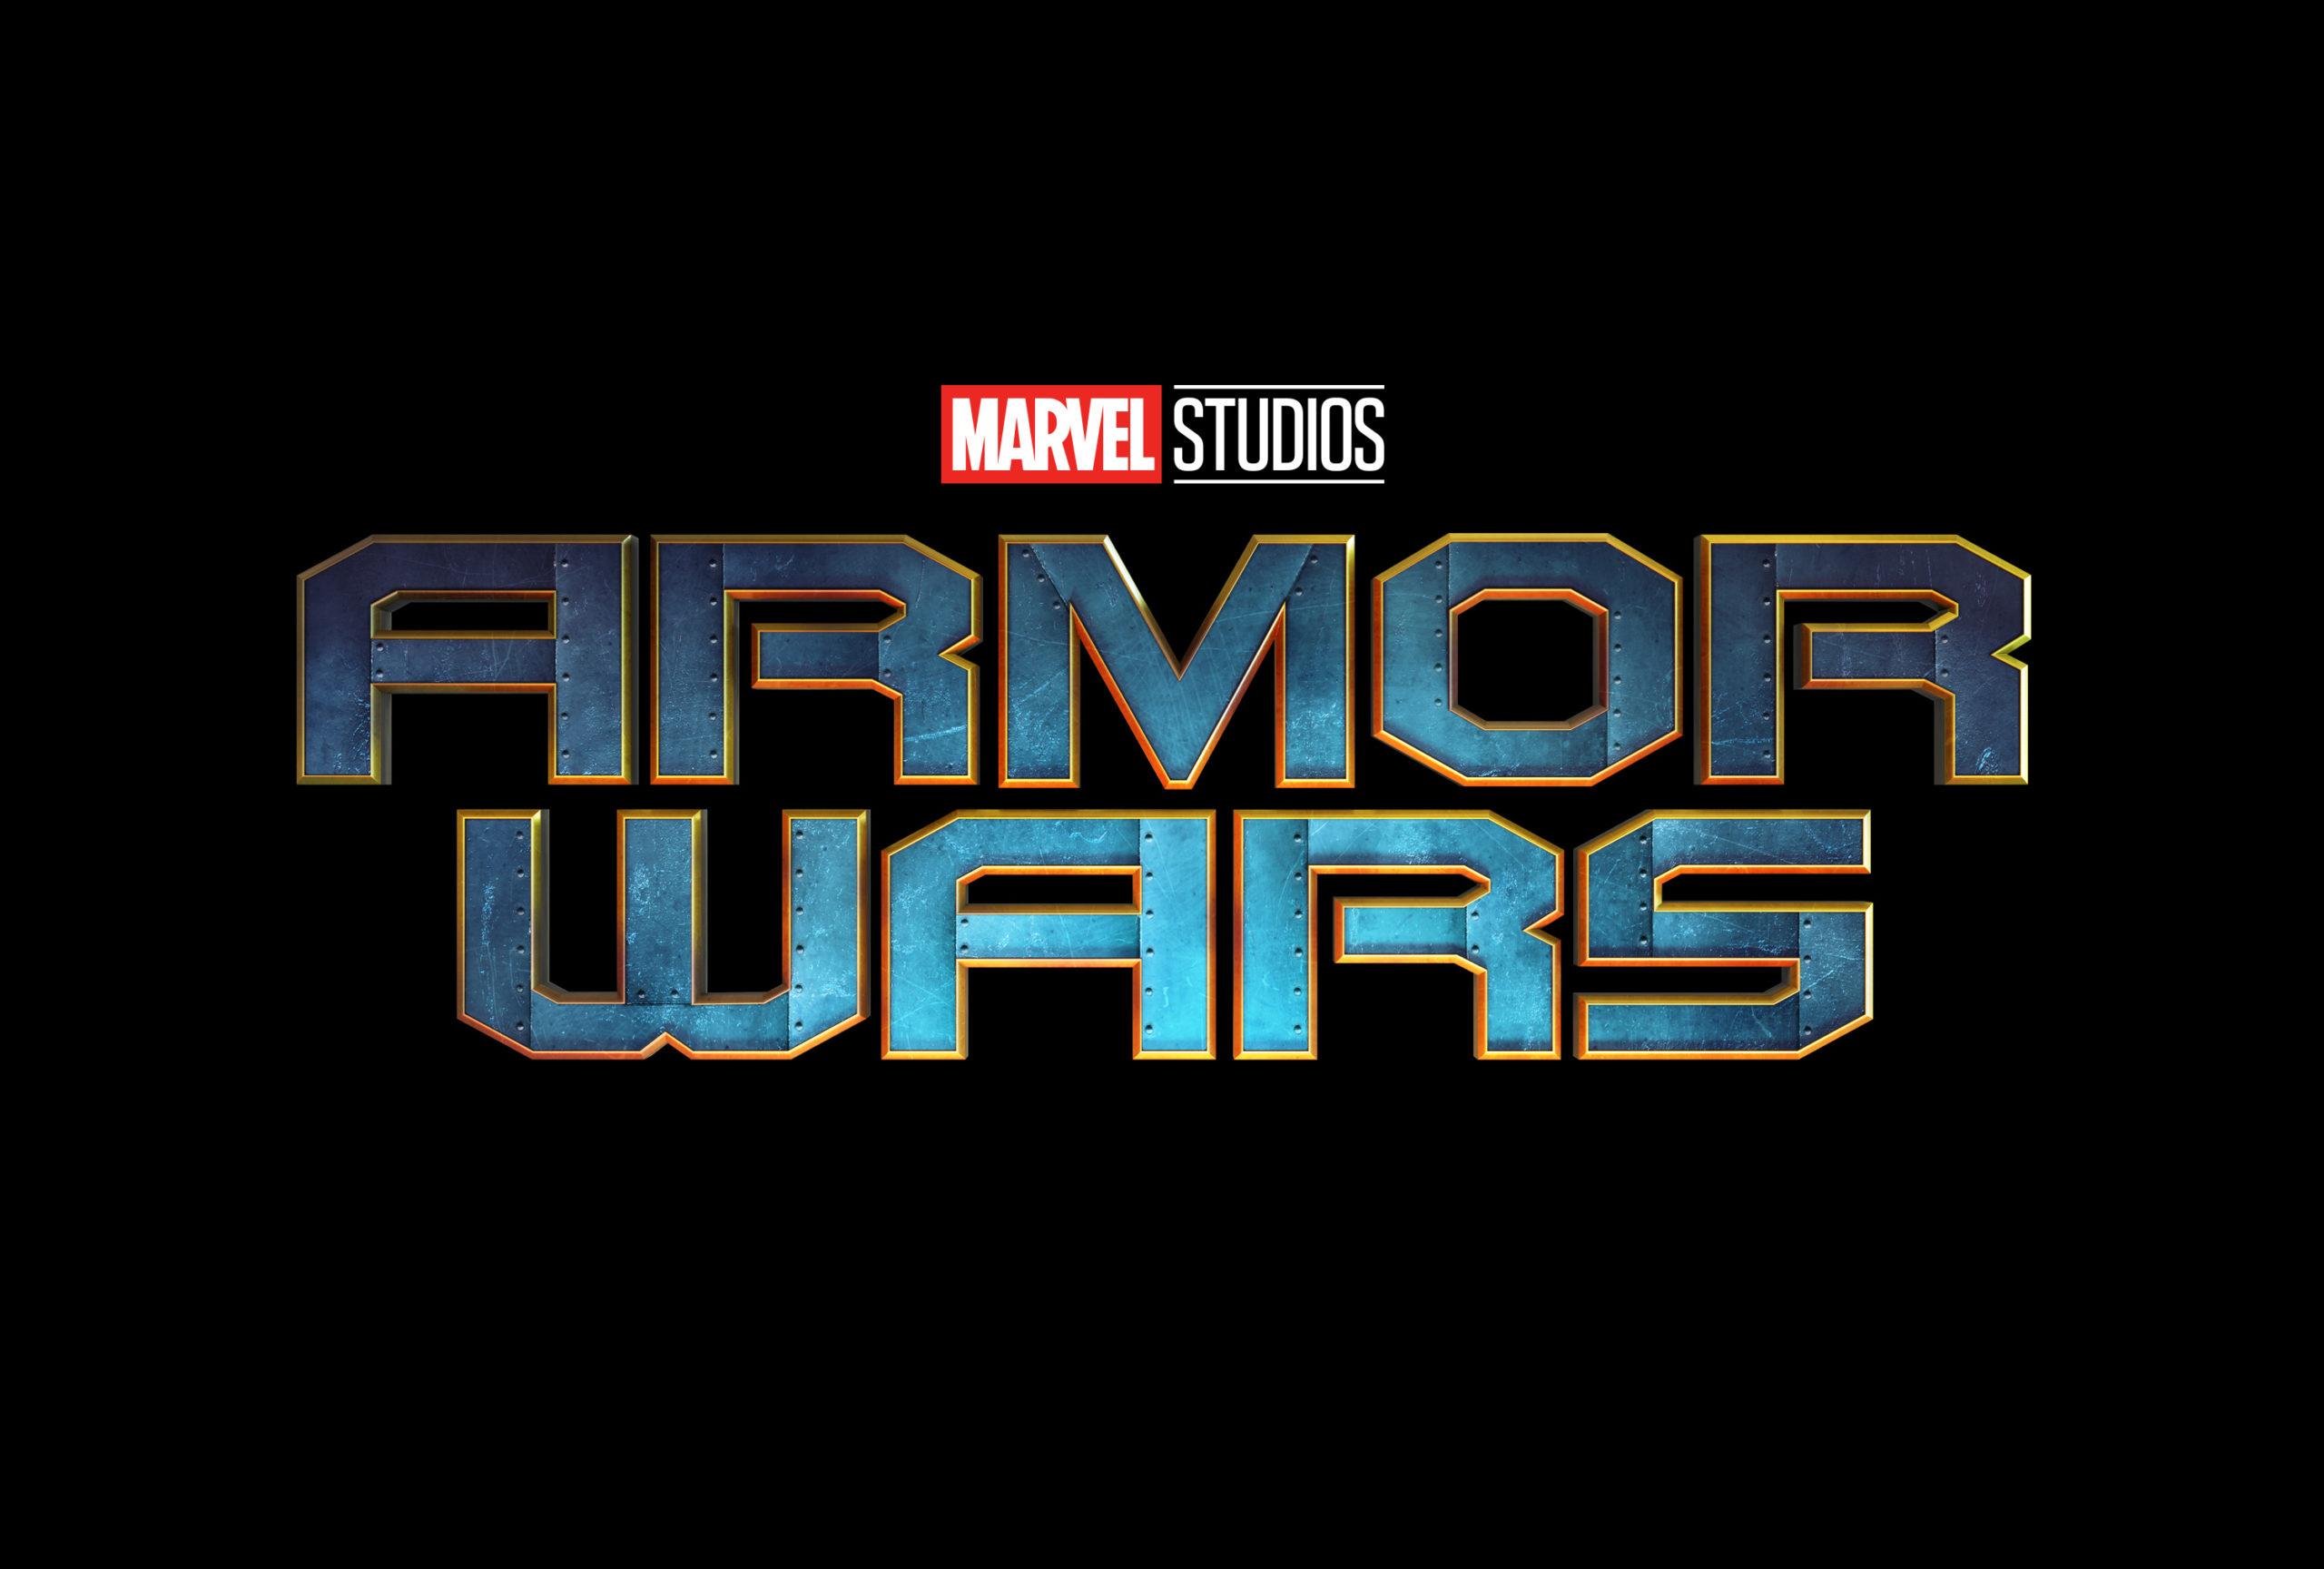 Armor Wars set to film this April